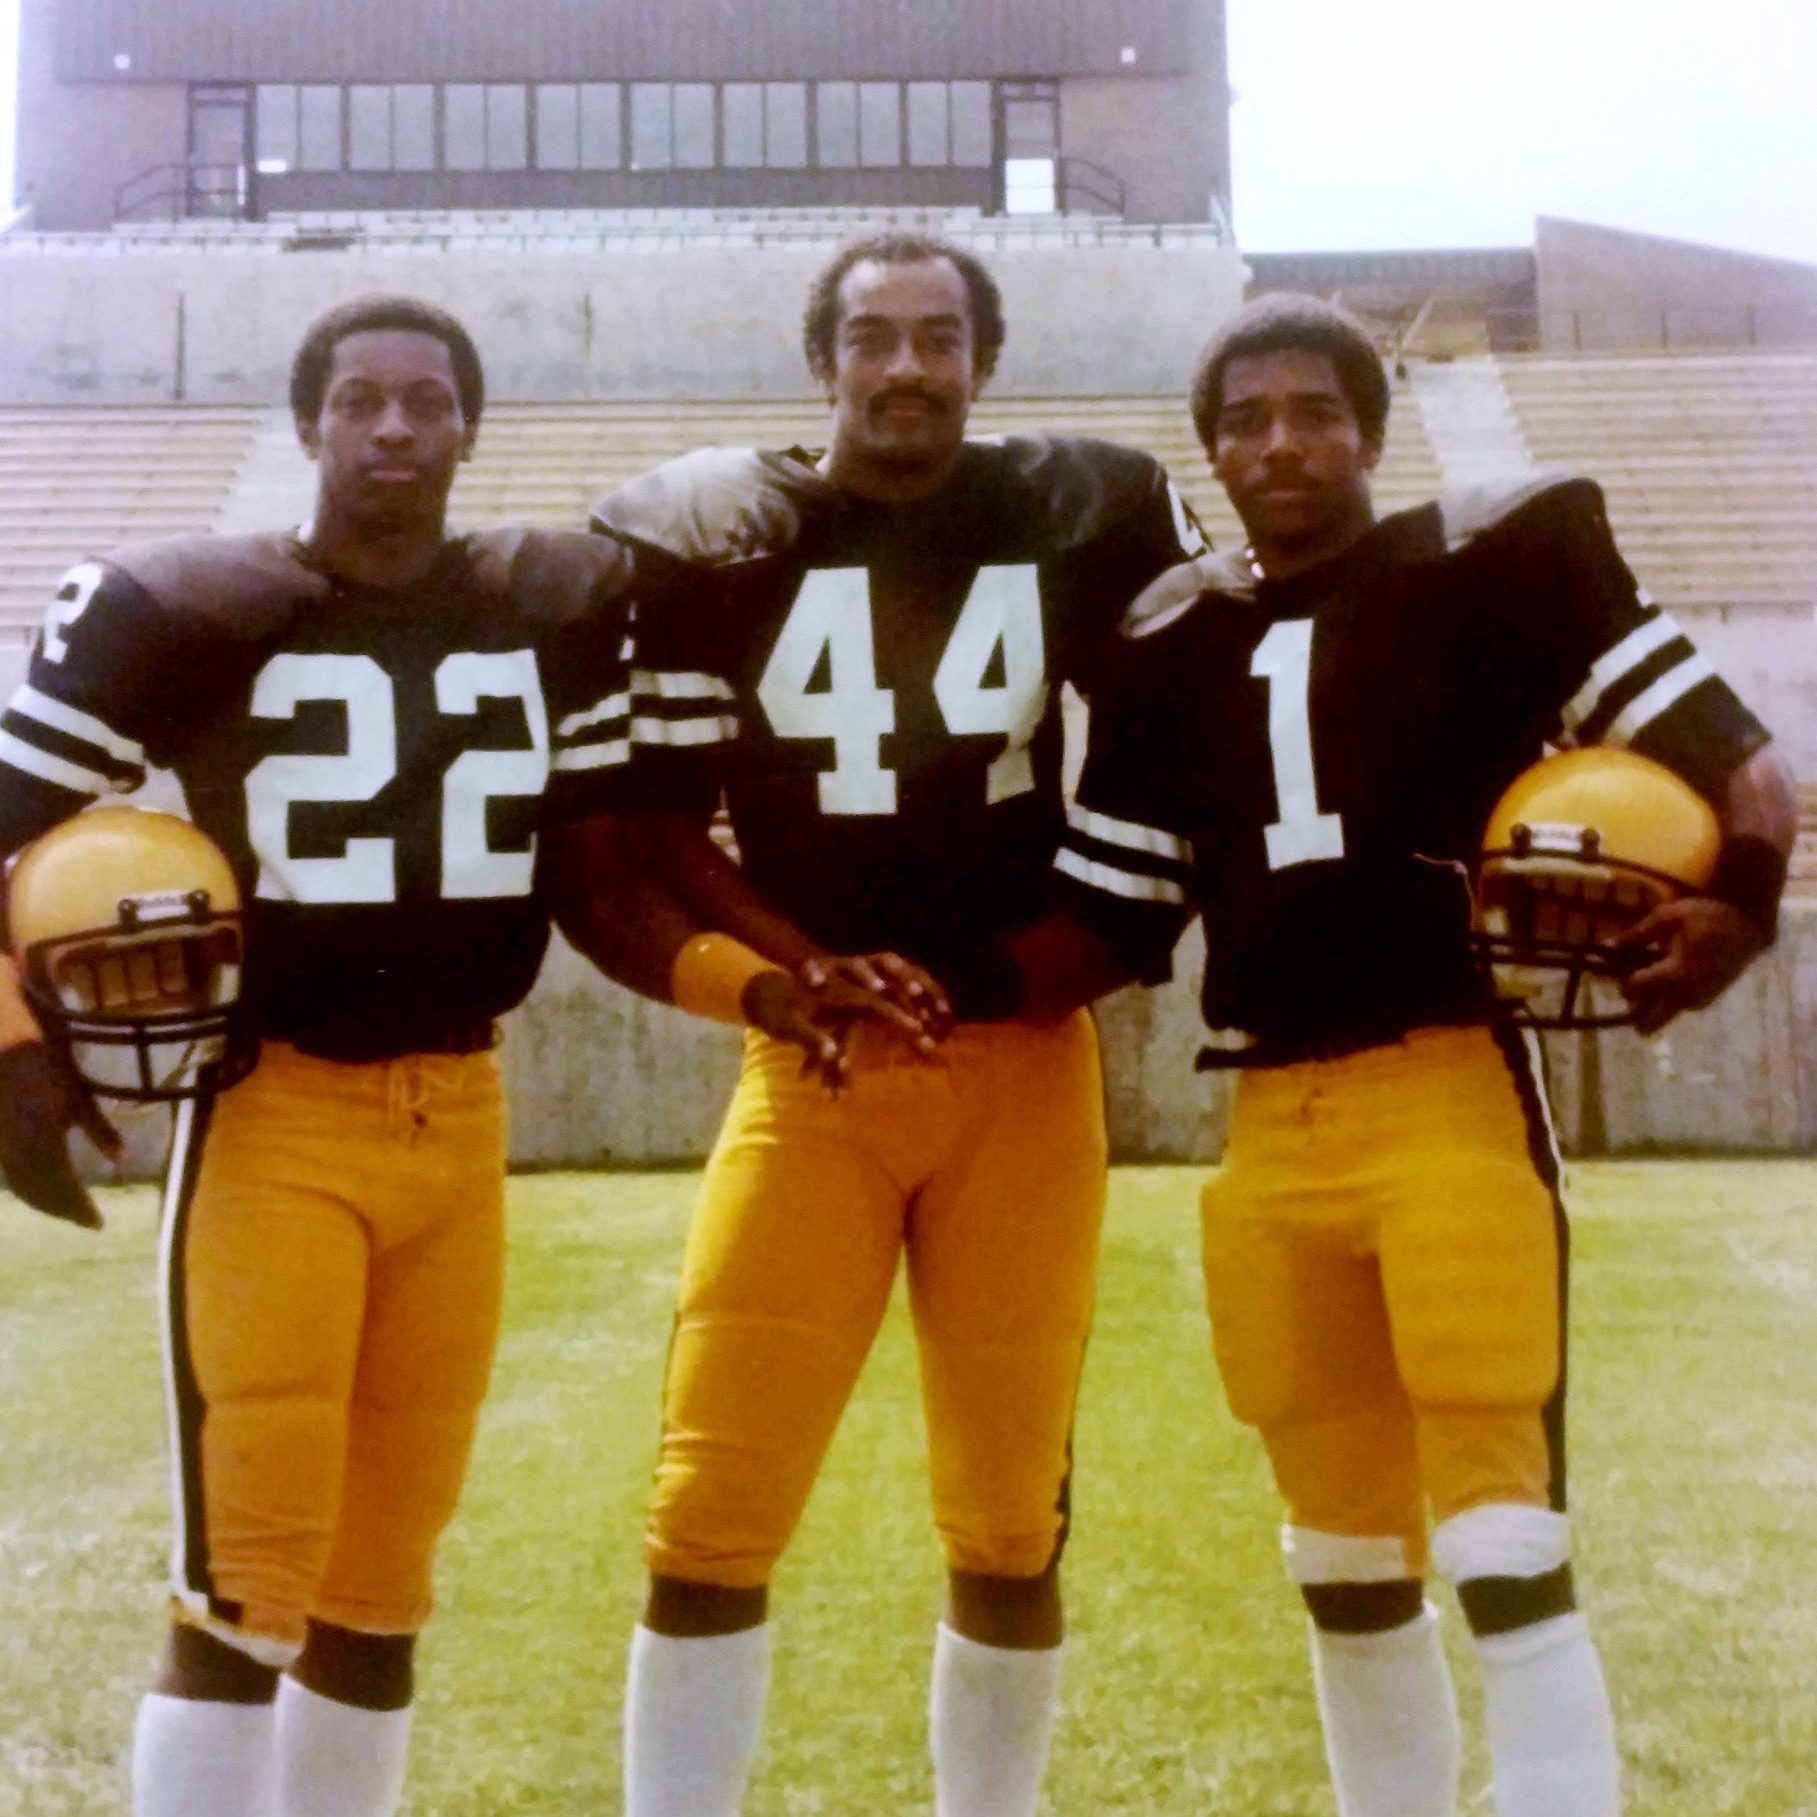 Tim Hoskins, Rodney Stephenson and Marc Lewis posing for photo in football uniforms, spratt stadium in background